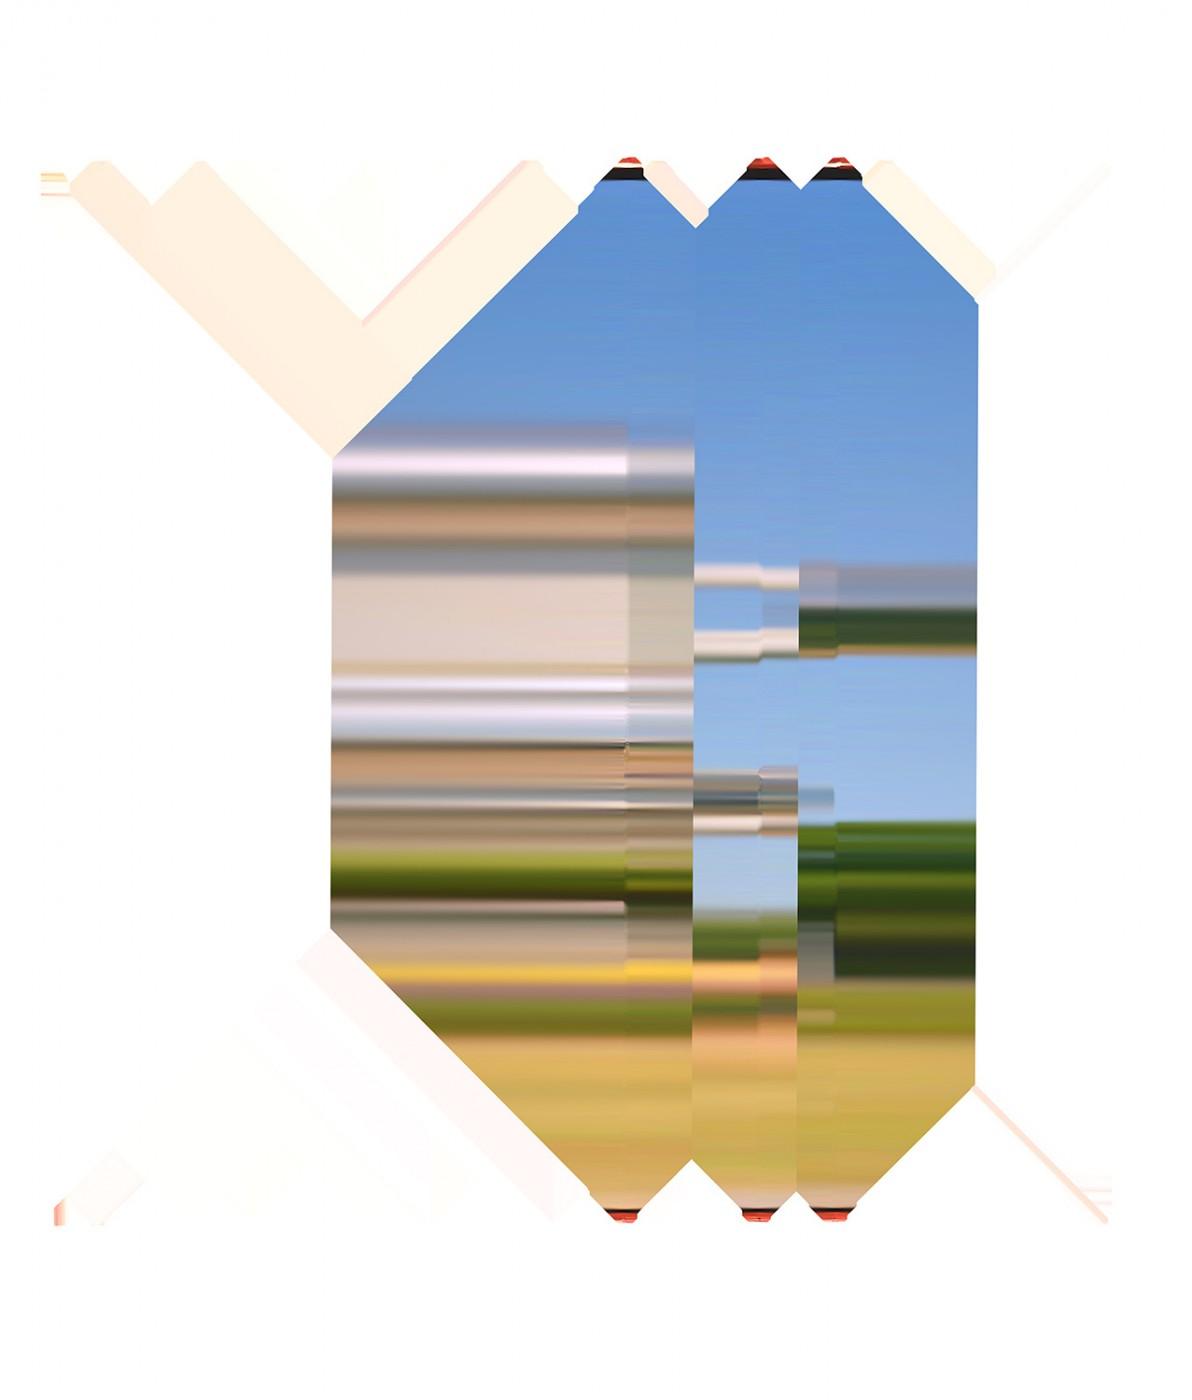 Toni Hafkescheid, 2015, </span><span><em>Scan Failure 1</em>